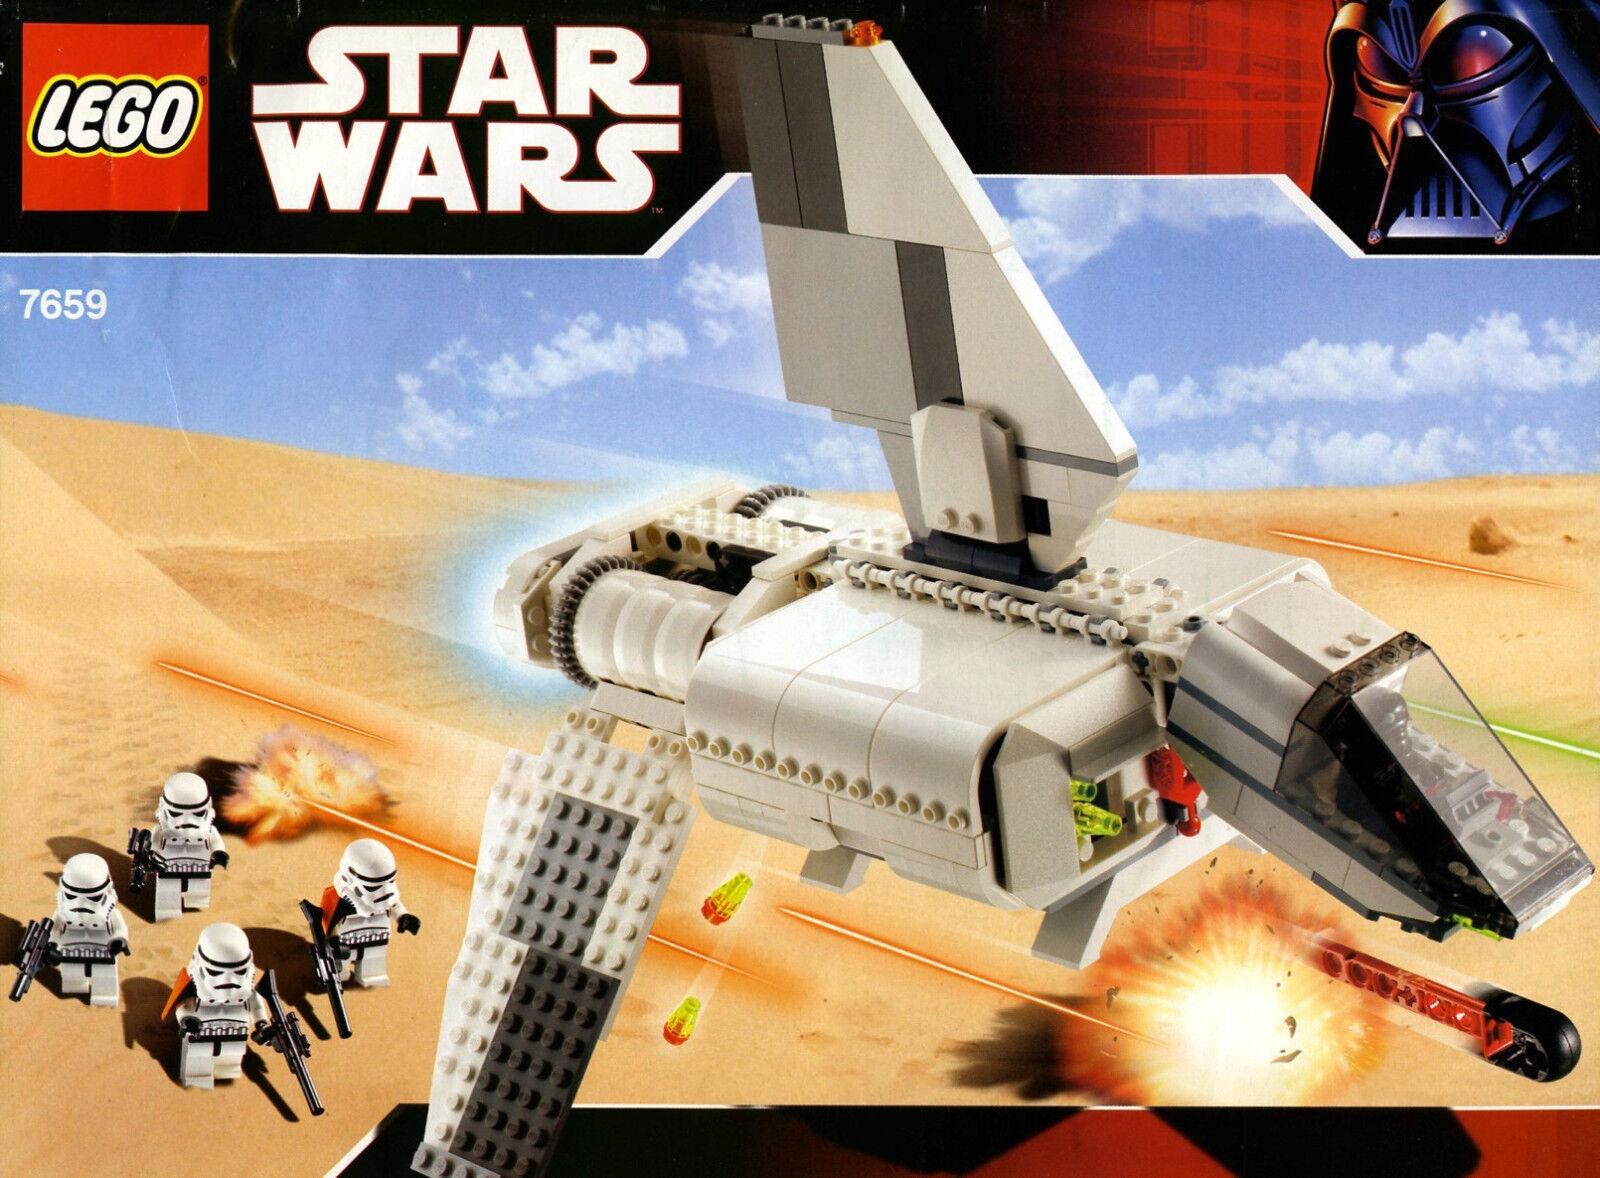 Lego 7659 Star Wars Imperial Landing Craft  Sealed Box